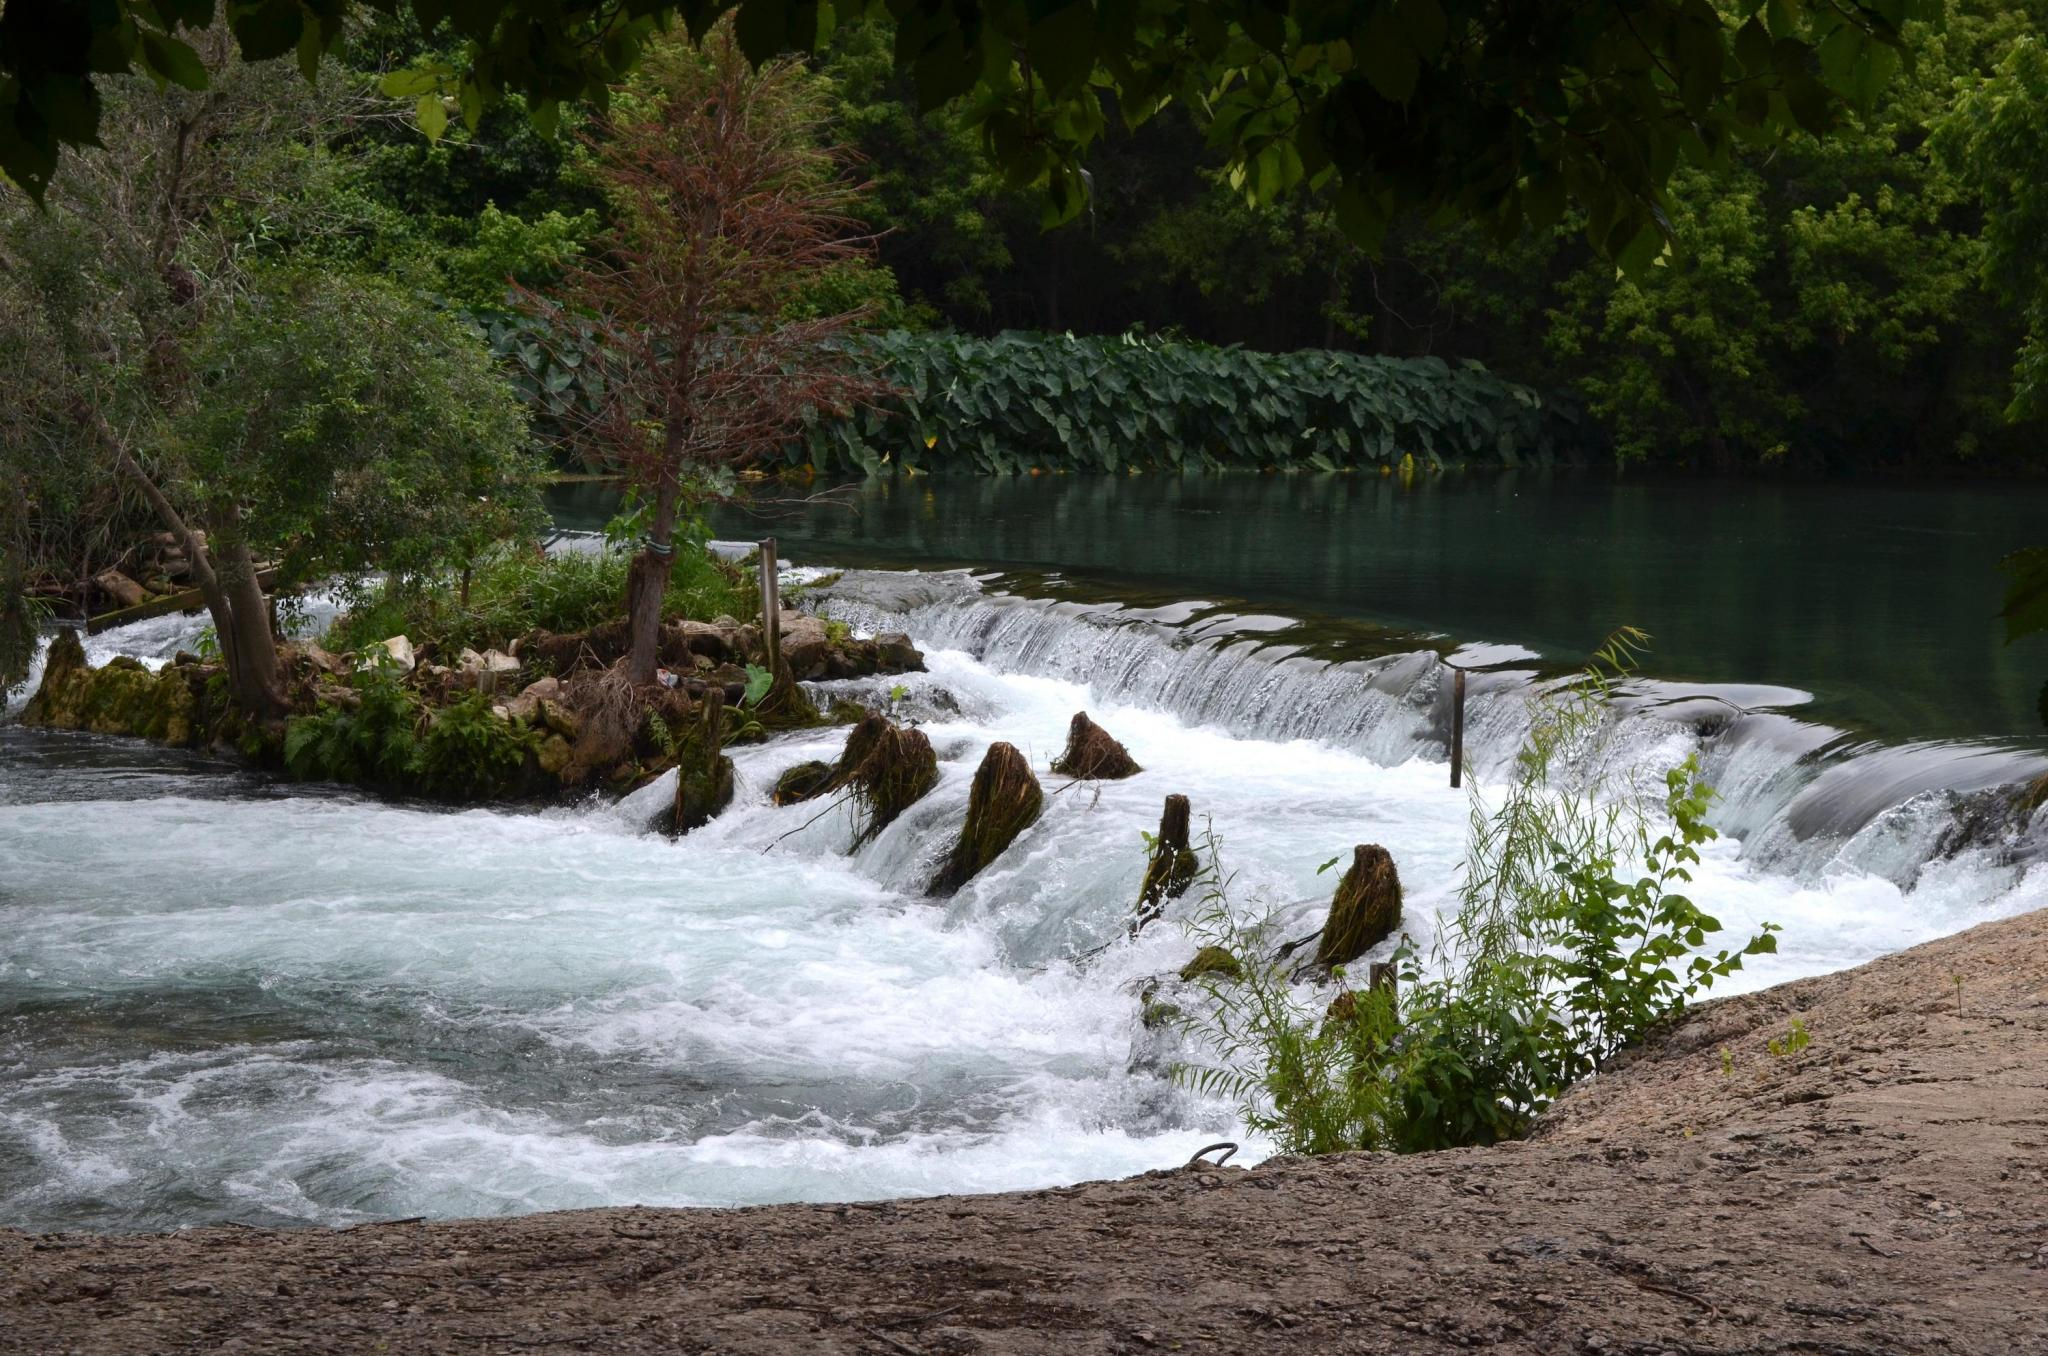 Hays County OKs Cape's Dam Agreement